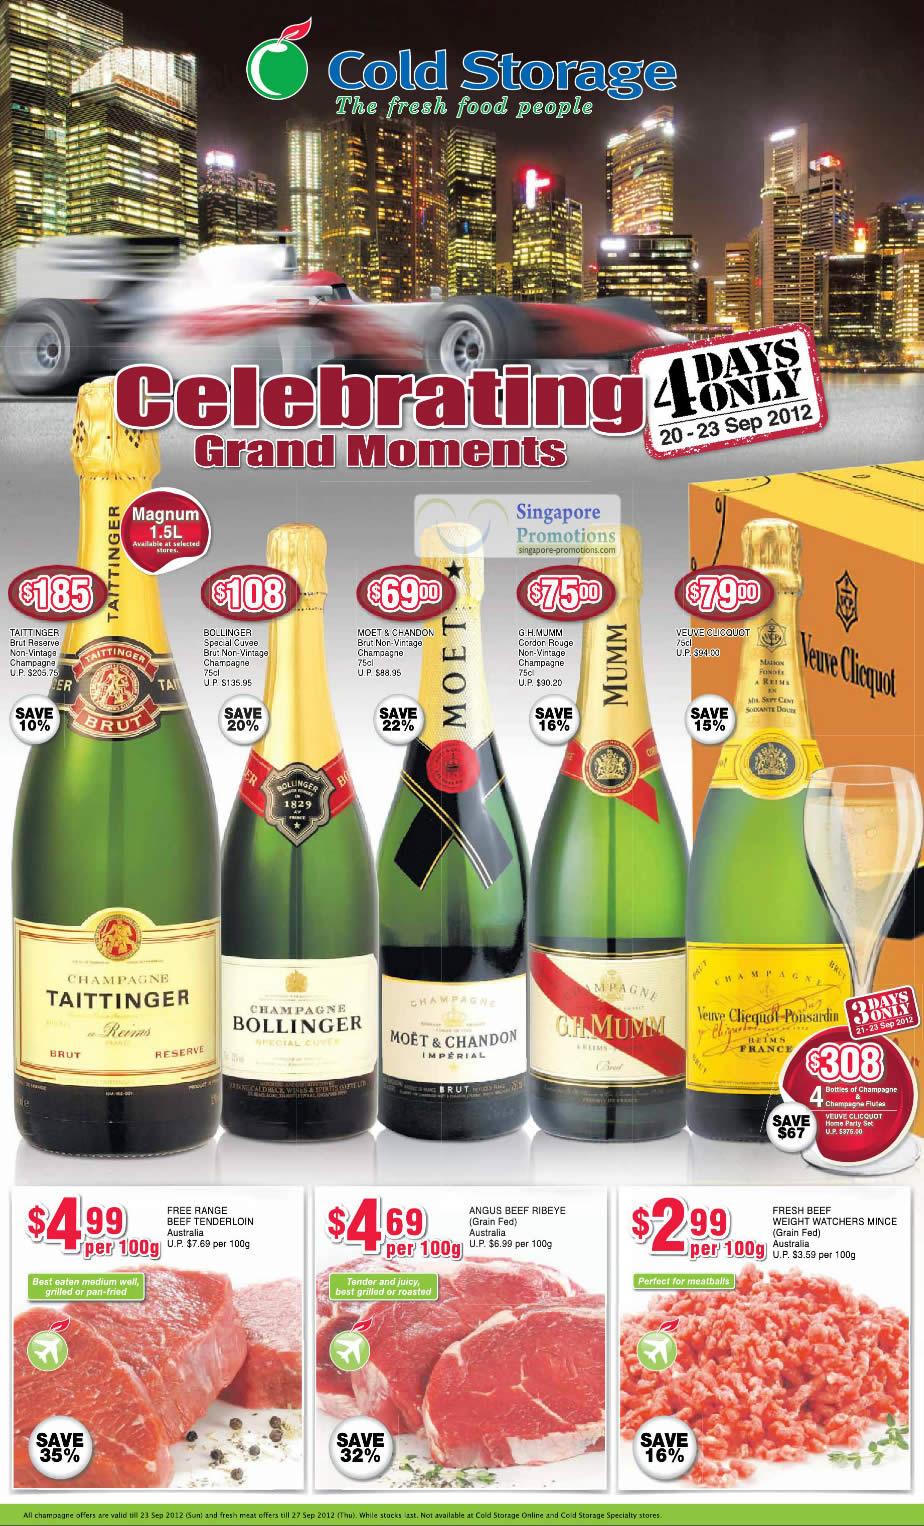 TAITTINGER Brut Reserve Non-Vintage Champagne, BOLLINGER Special Cuvee Brut Non-Vintage Champagne, MOET & CHANDON Brut Non-Vintage Champagne, G.H.MUMM Cordon Rouge Non-Vintage Champagne, VEUVE CLICQUOT